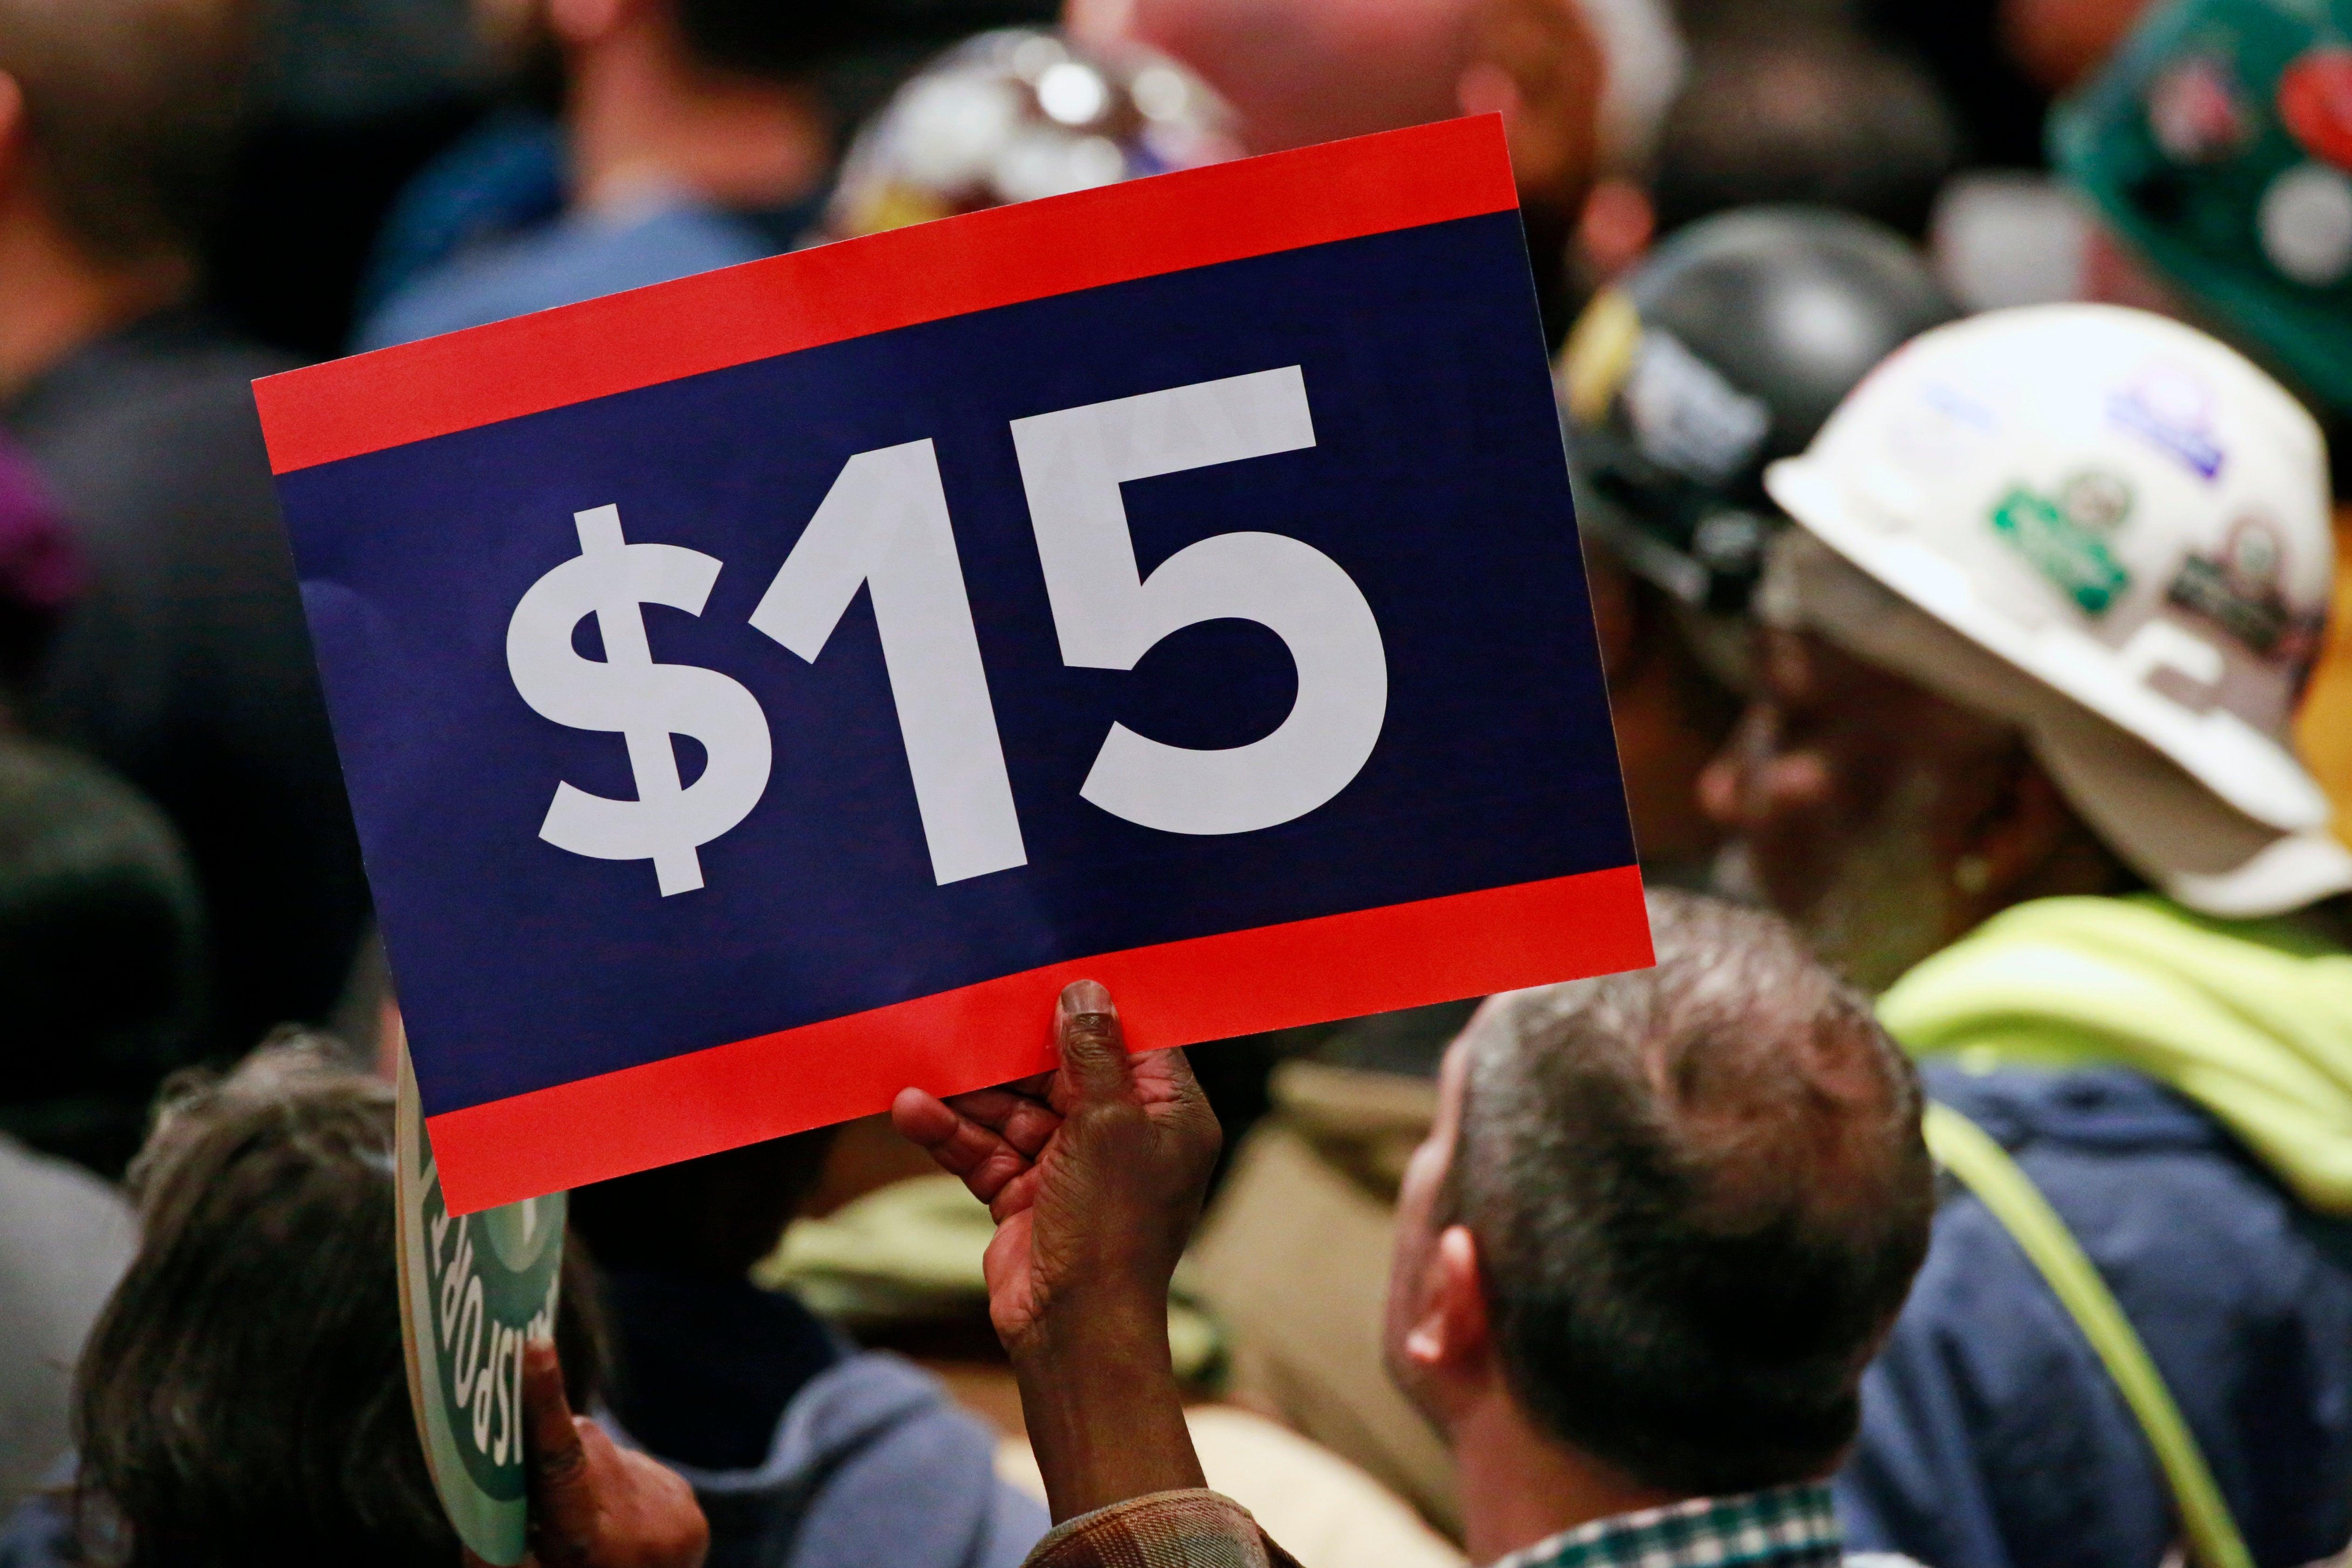 A worker holds up a sign demanding a $15 minimum wage